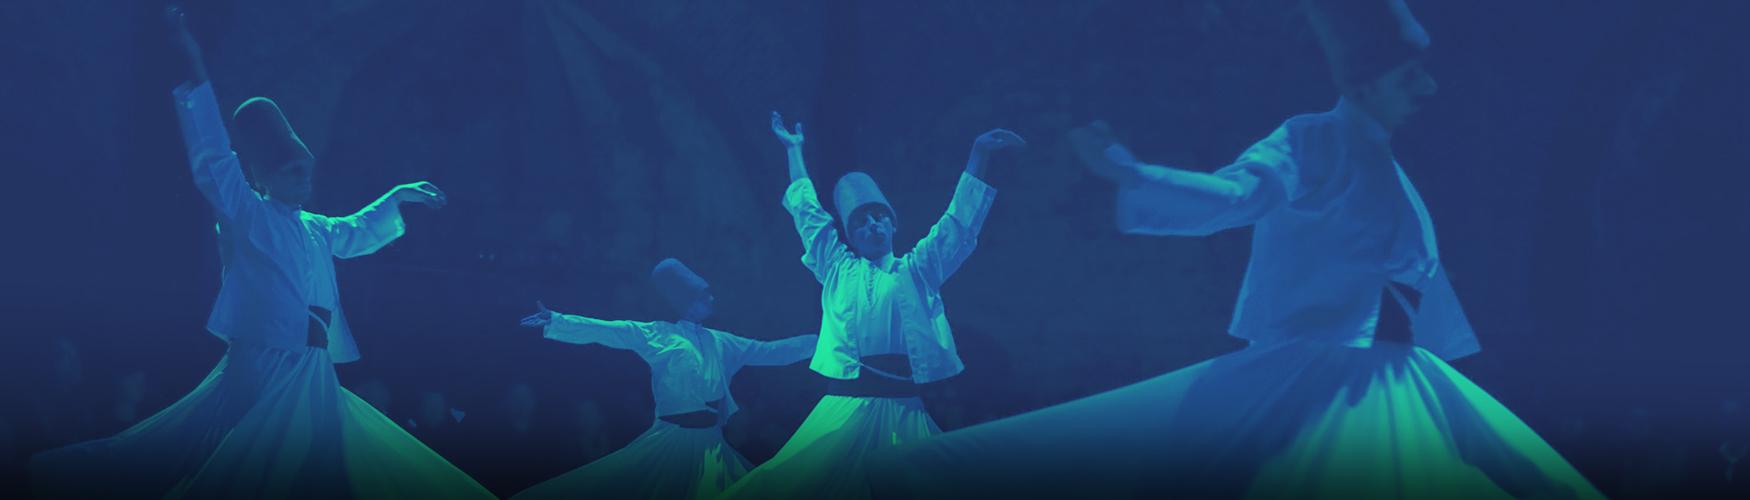 Sufi Songs Download- Best Sufi Music, Top Sufi Songs Online